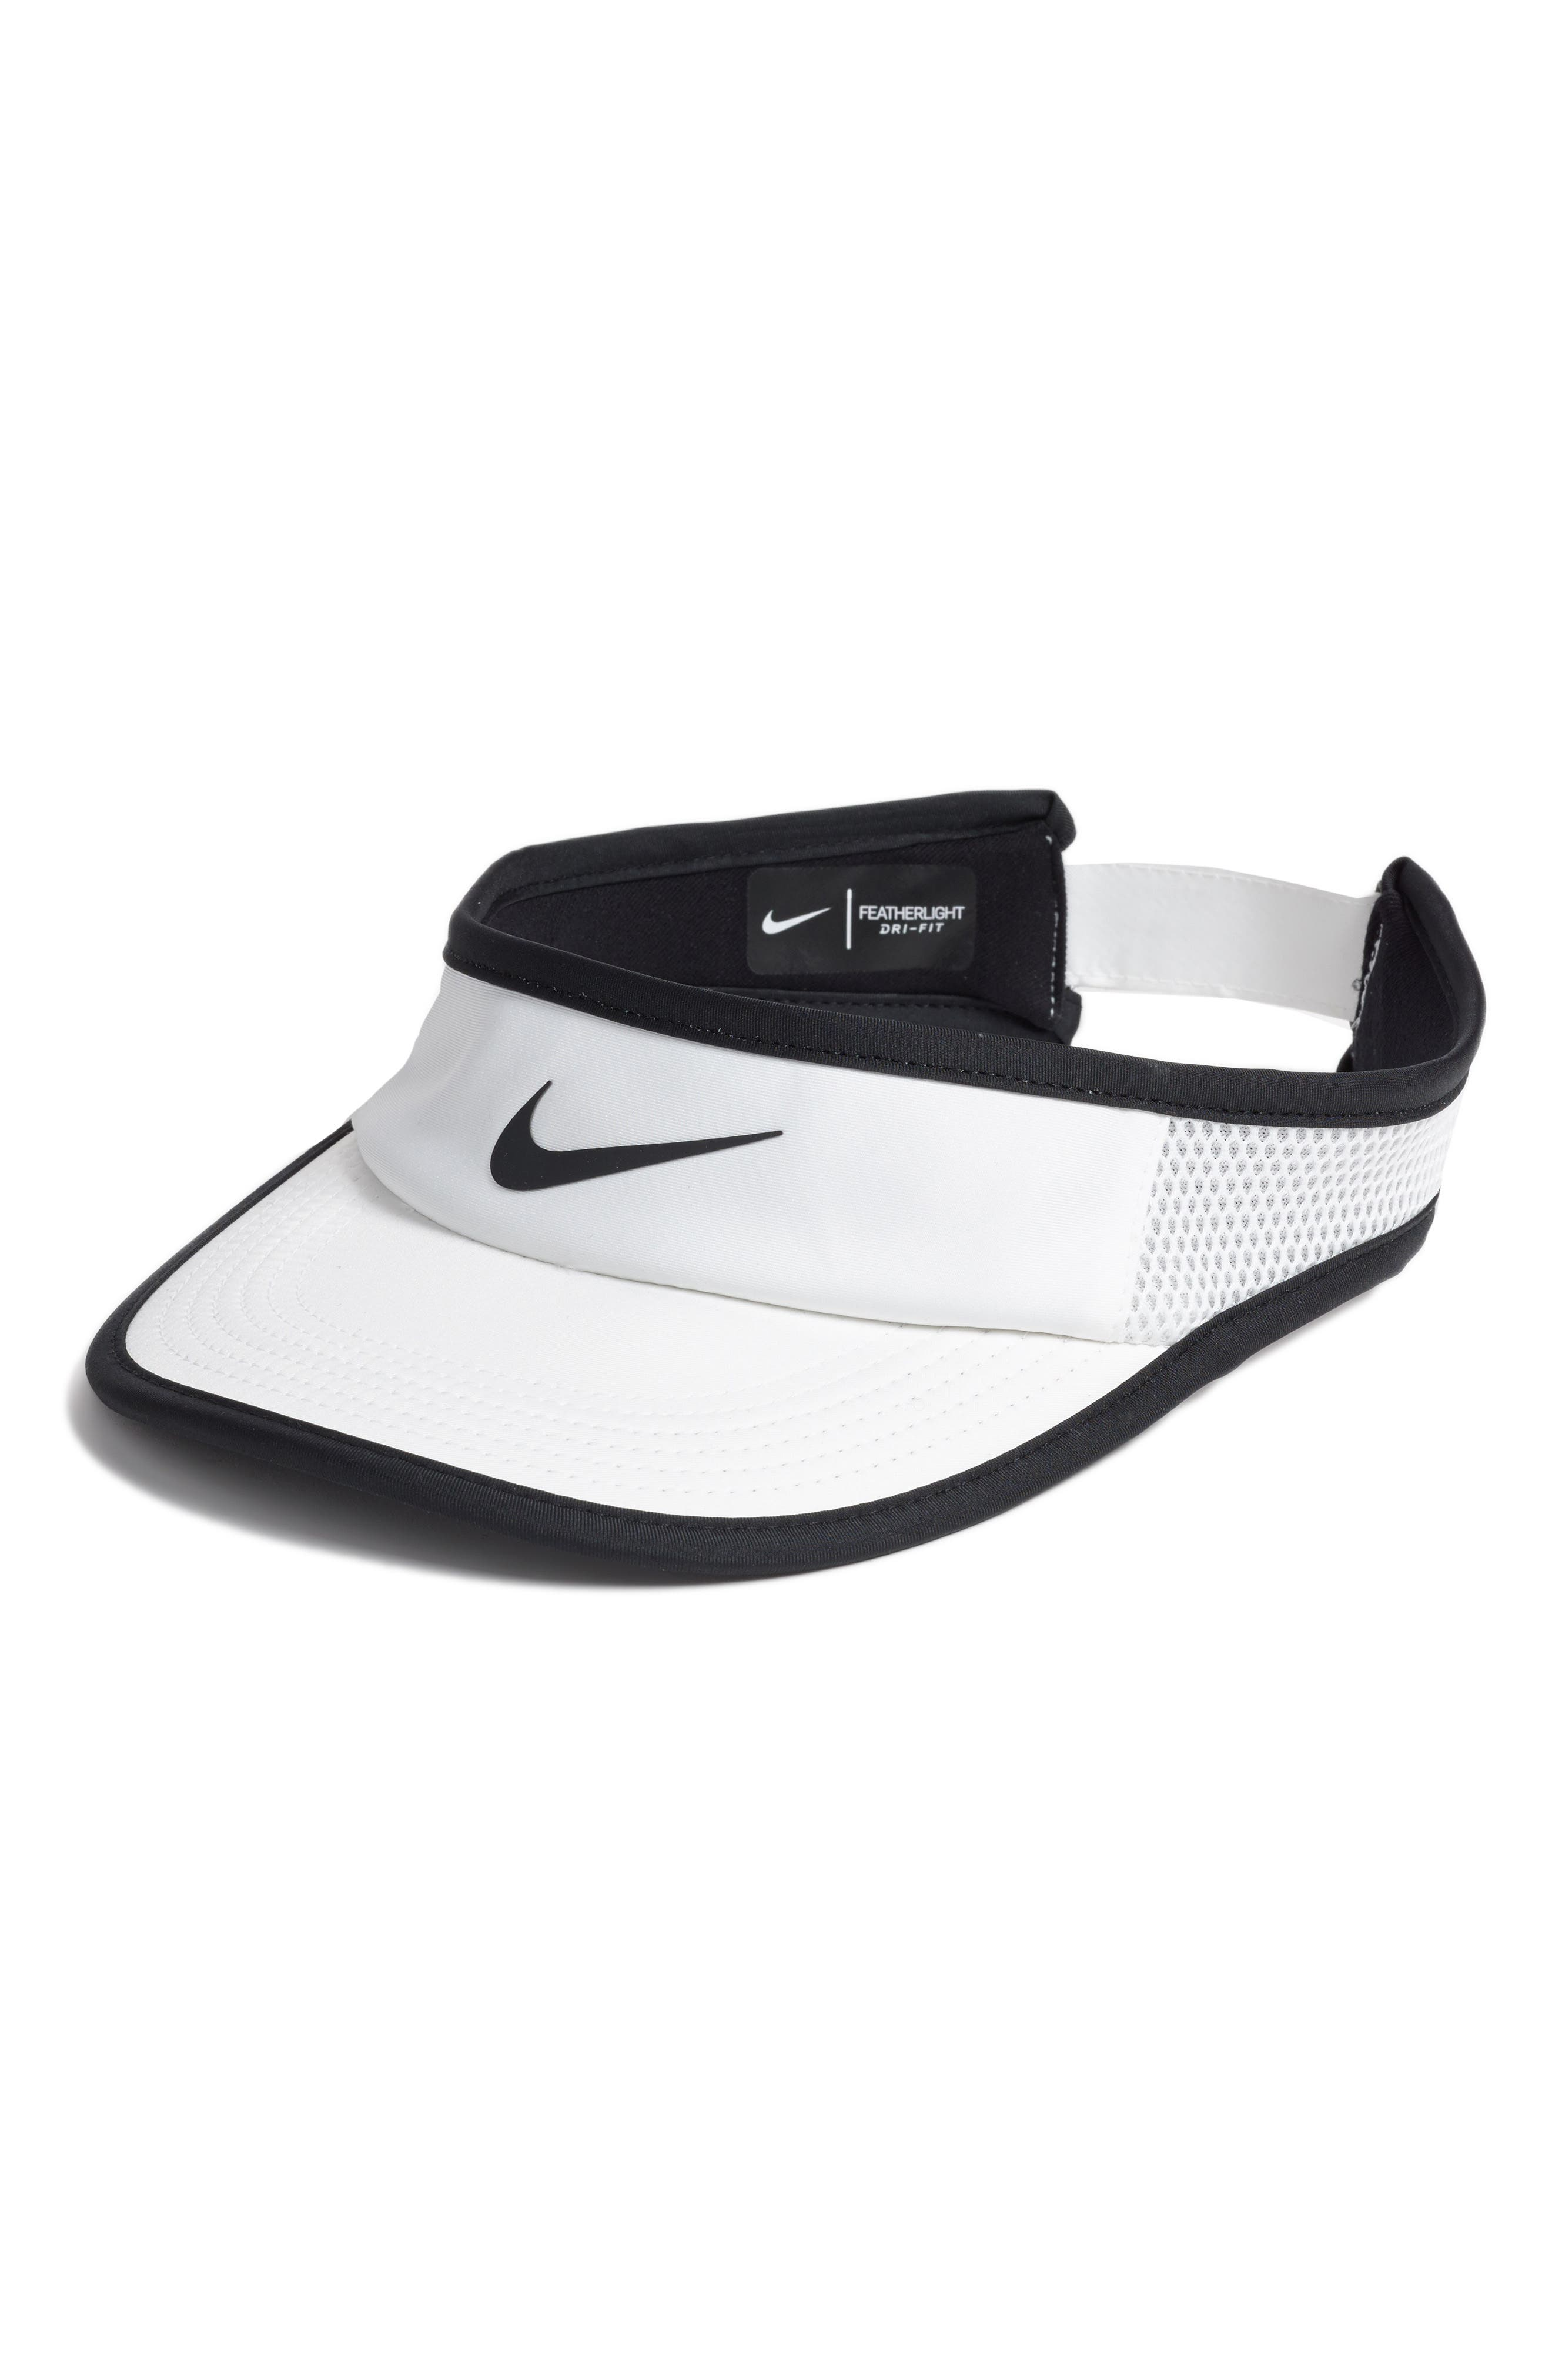 Court AeroBill Tennis Visor,                             Main thumbnail 1, color,                             White/ White/ Black/ Black